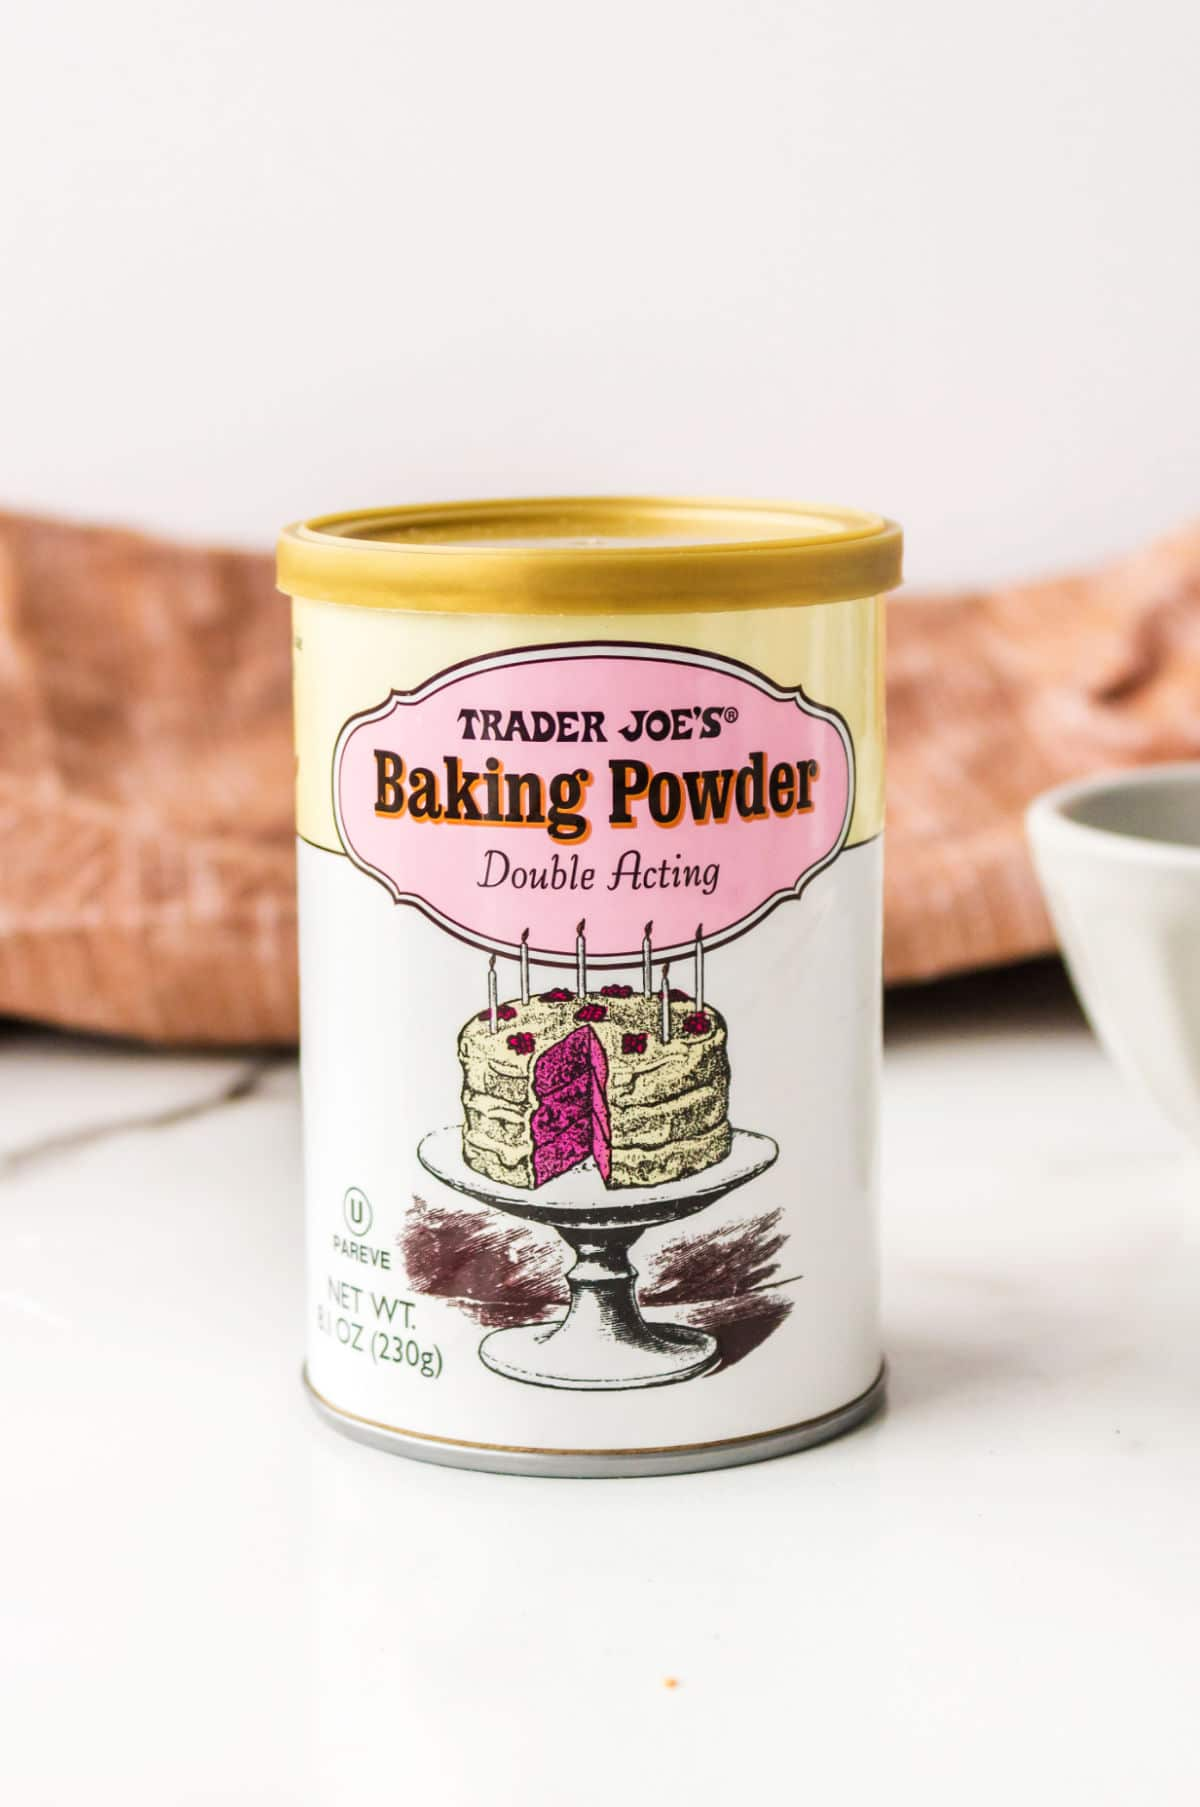 Can of baking powder next to a white bowl.